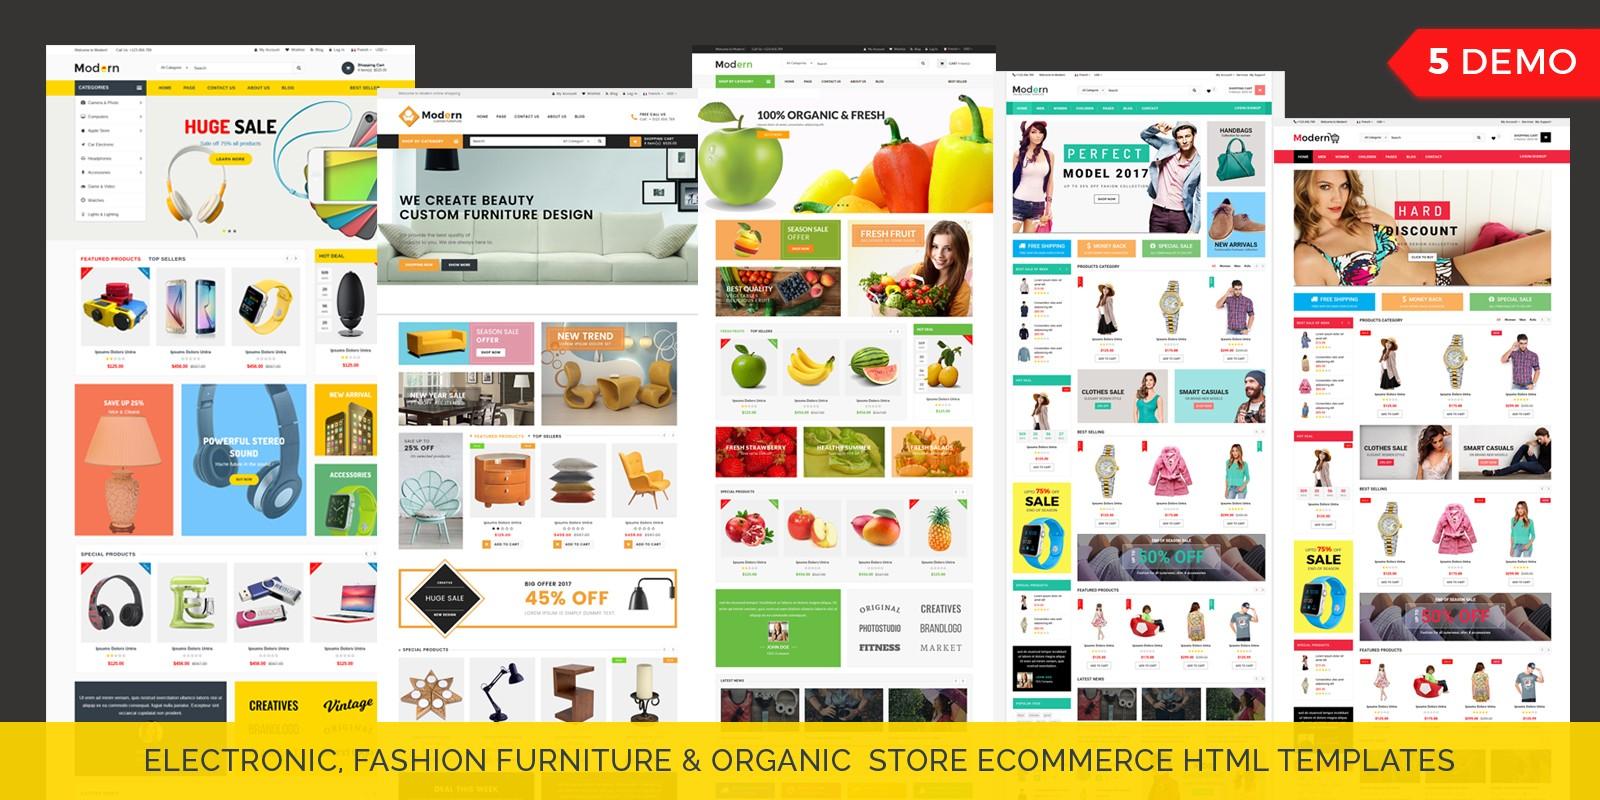 Modern - Multipurpose Website Template